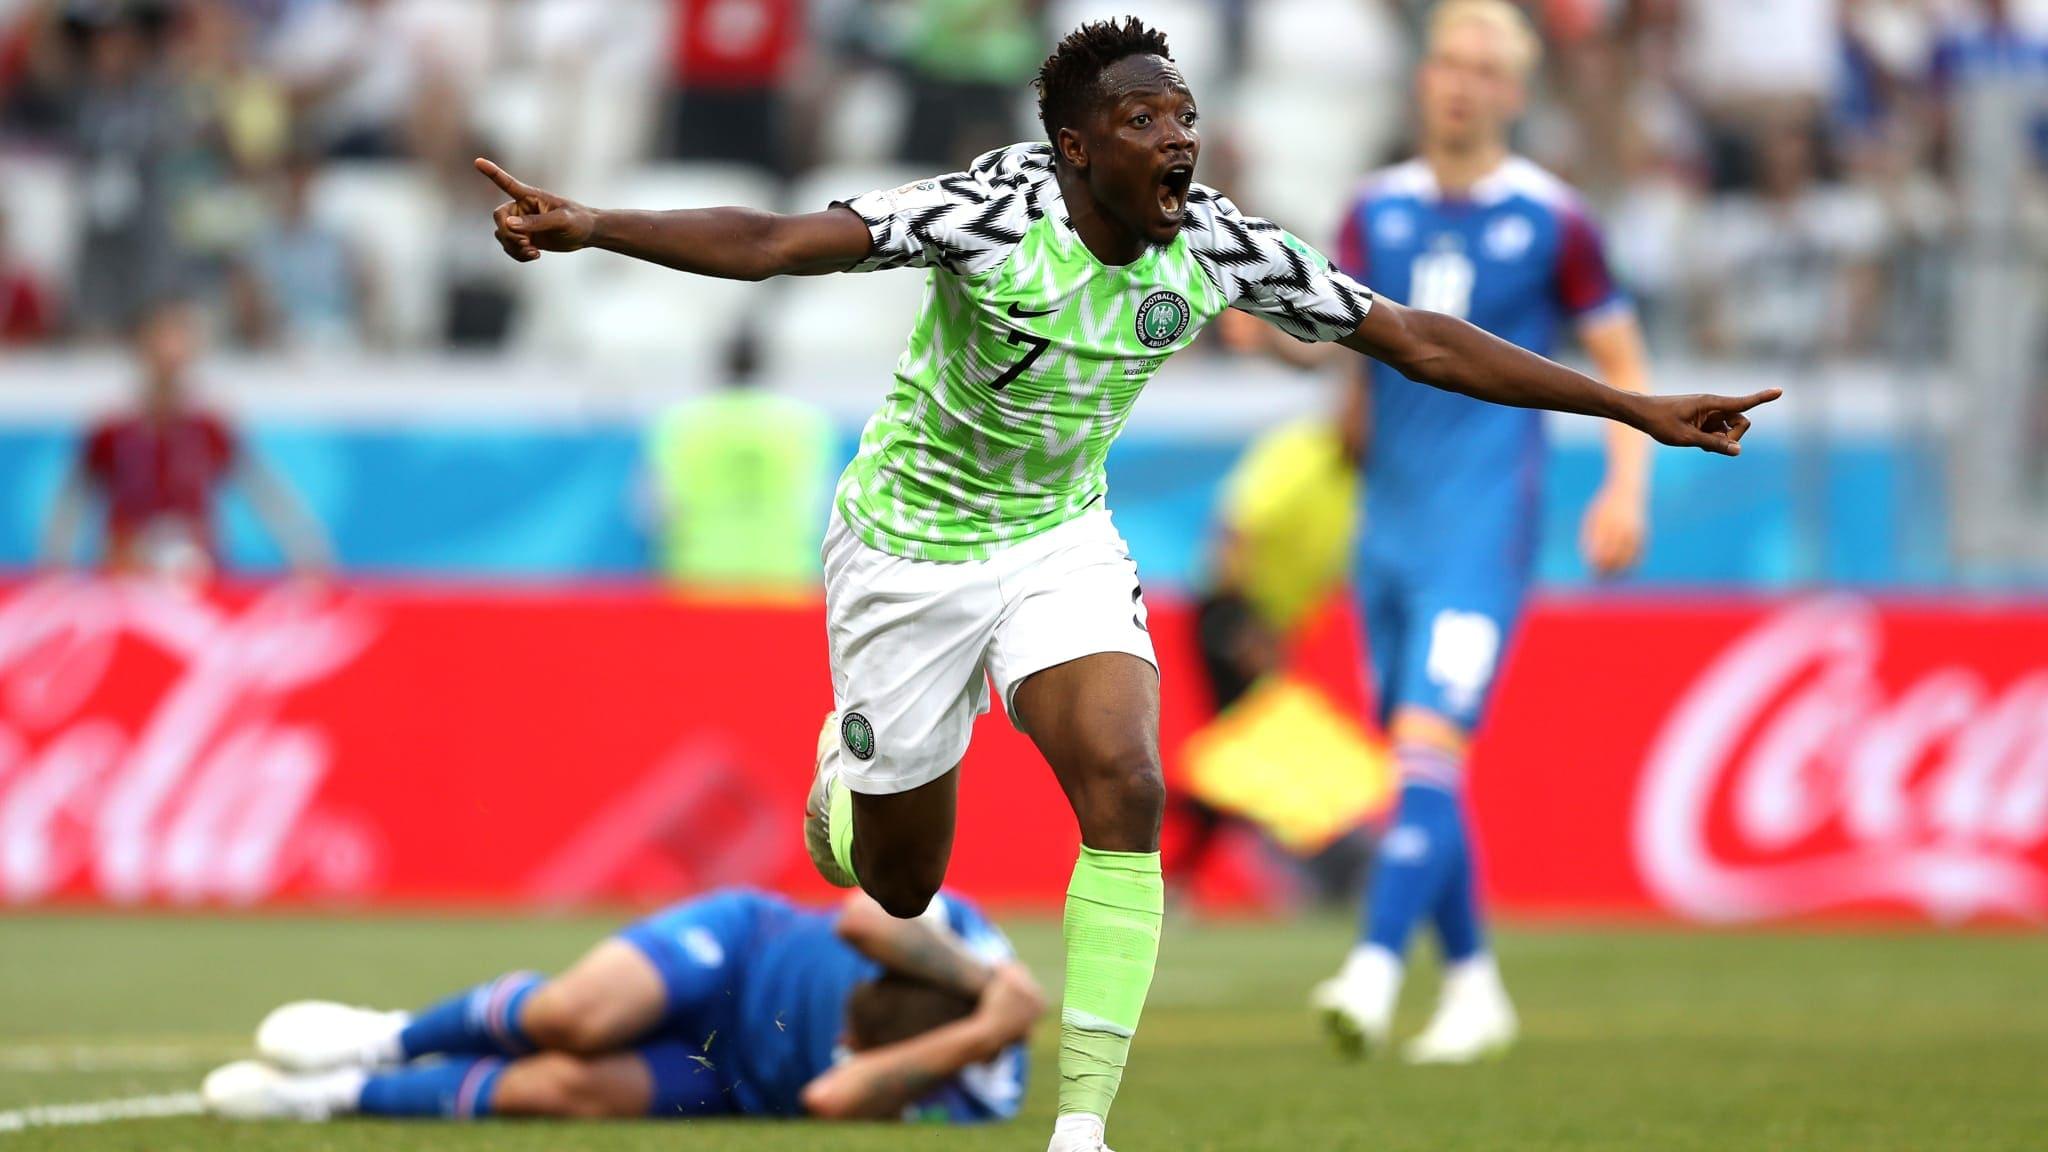 Nigeria Suma Sus Primeros 3 Puntos Al Vencer A Islandia